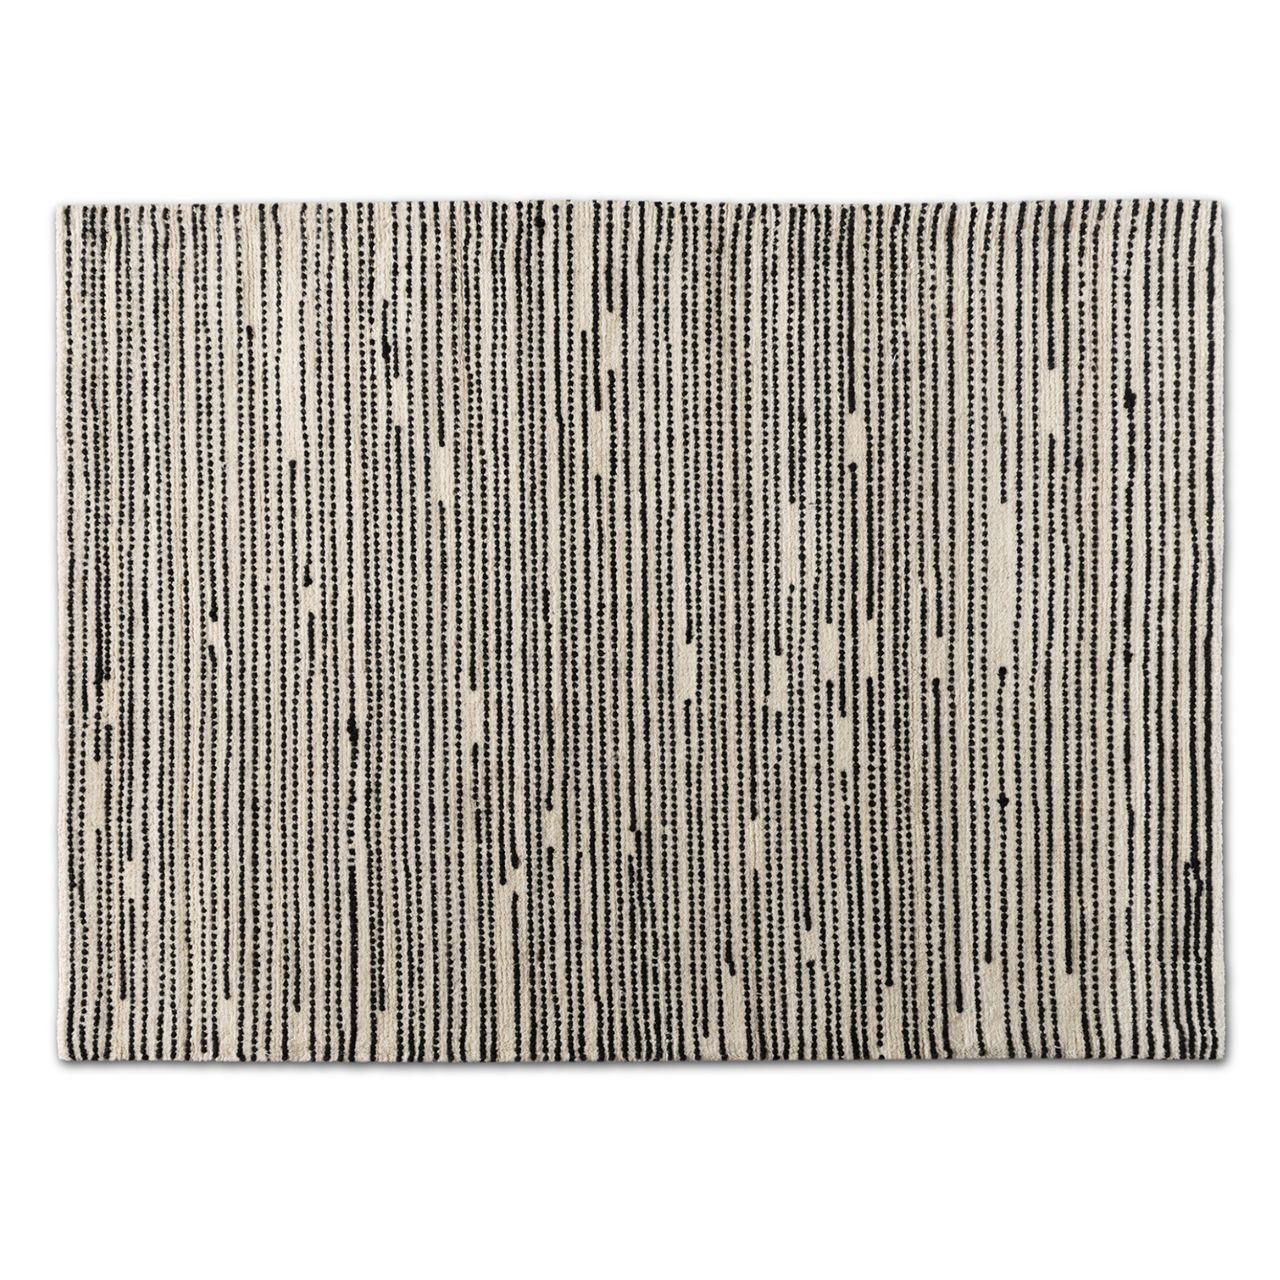 Baxton Studio Amorica Black/Ivory Handwoven Wool Area Rug